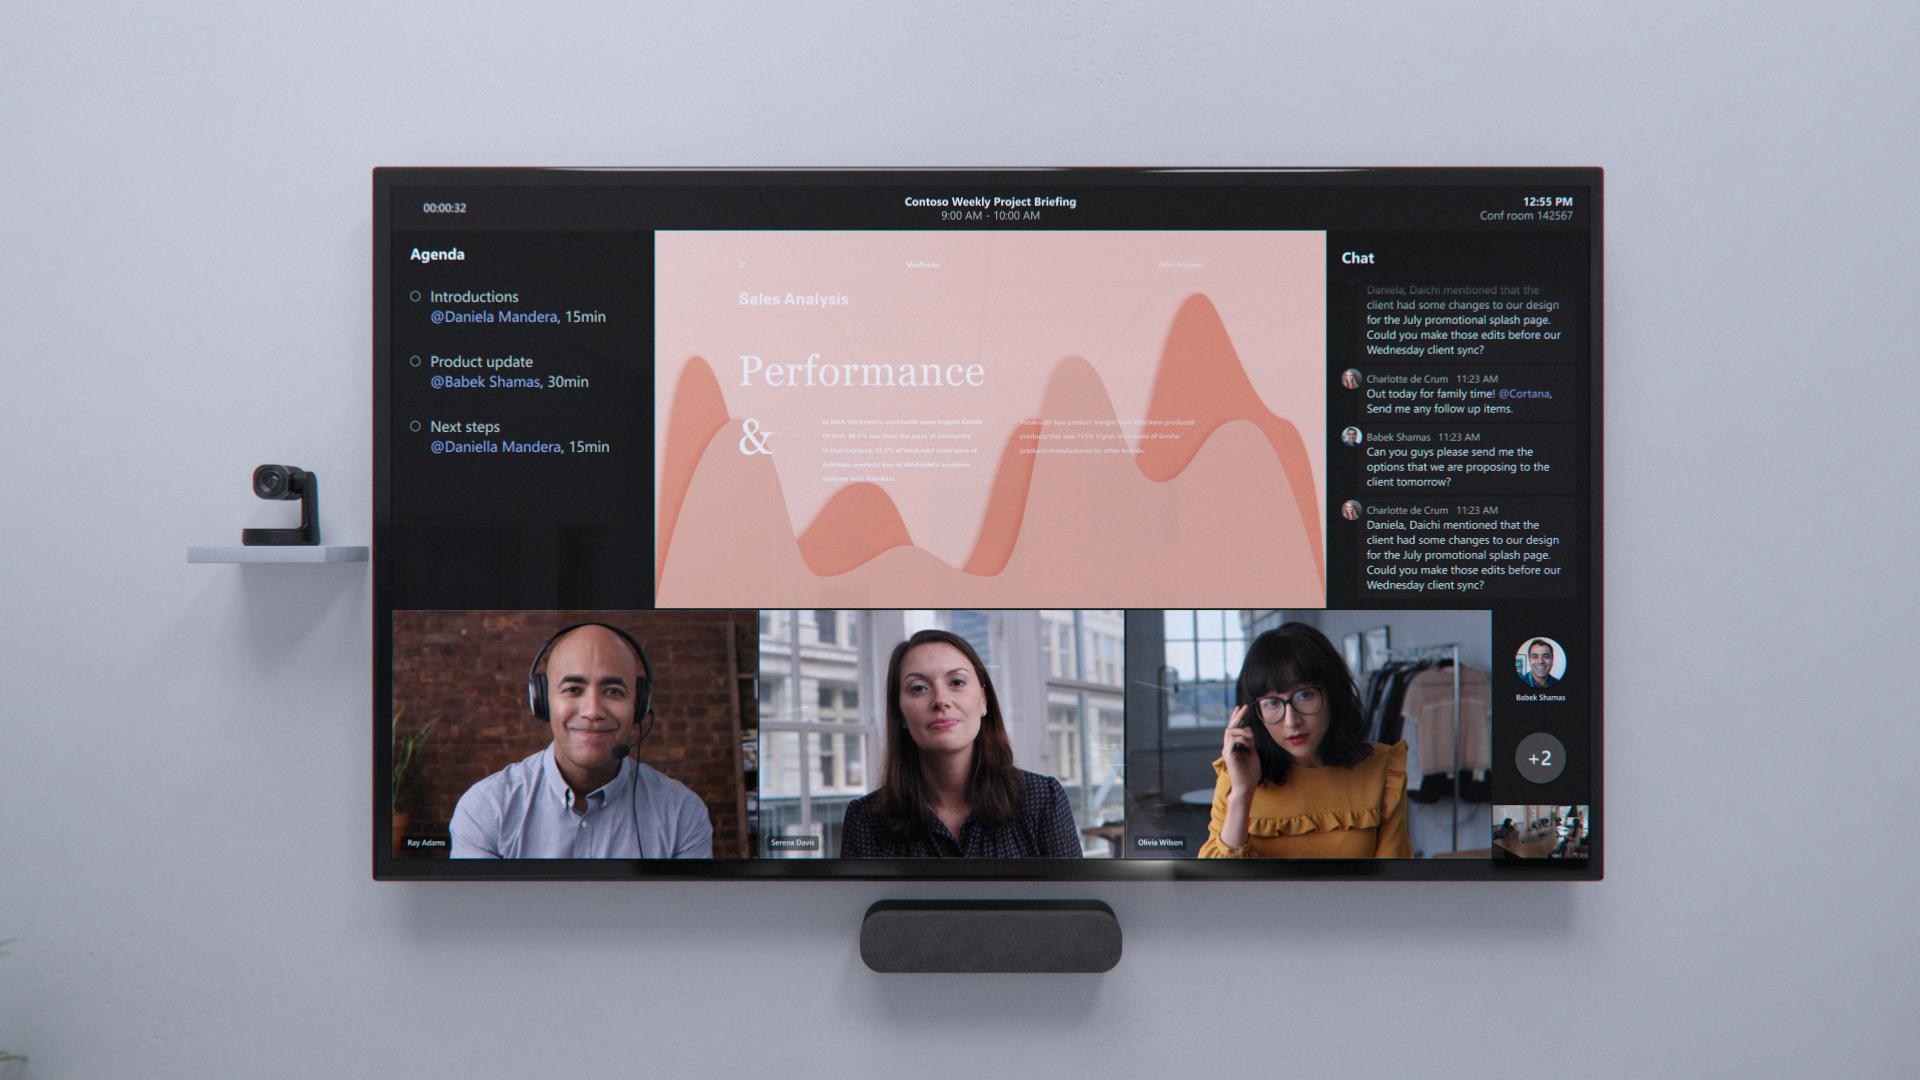 Microsoft Teams meeting rooms for hybrid work